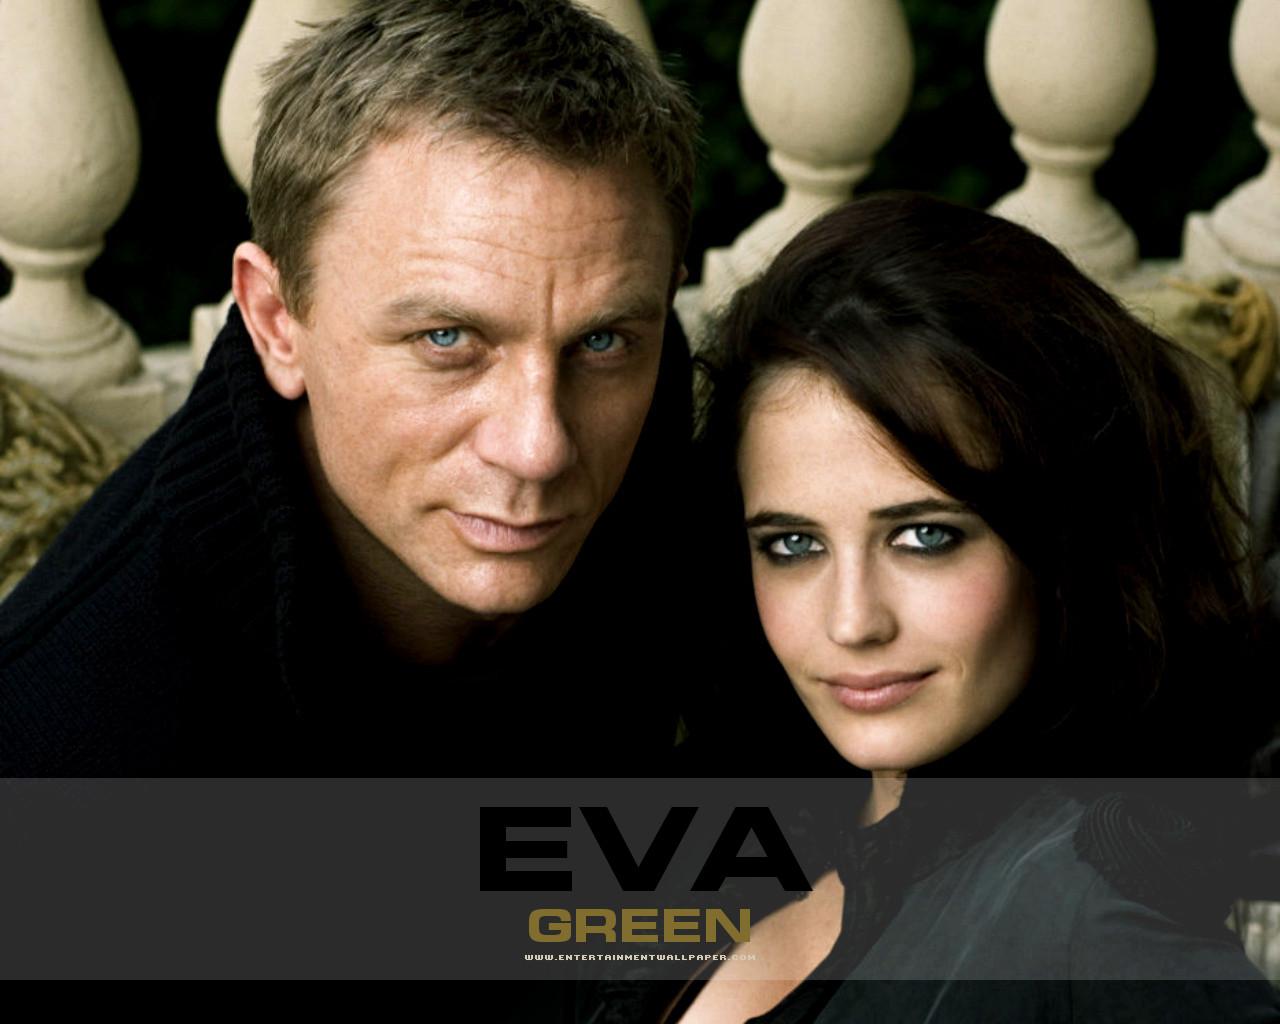 http://3.bp.blogspot.com/-vEaFKo-QRSI/Trwpdl0h71I/AAAAAAAAAlk/_RvYtkFpa64/s1600/Eva+Green+Picture-A+Bond+Girl-42.jpg